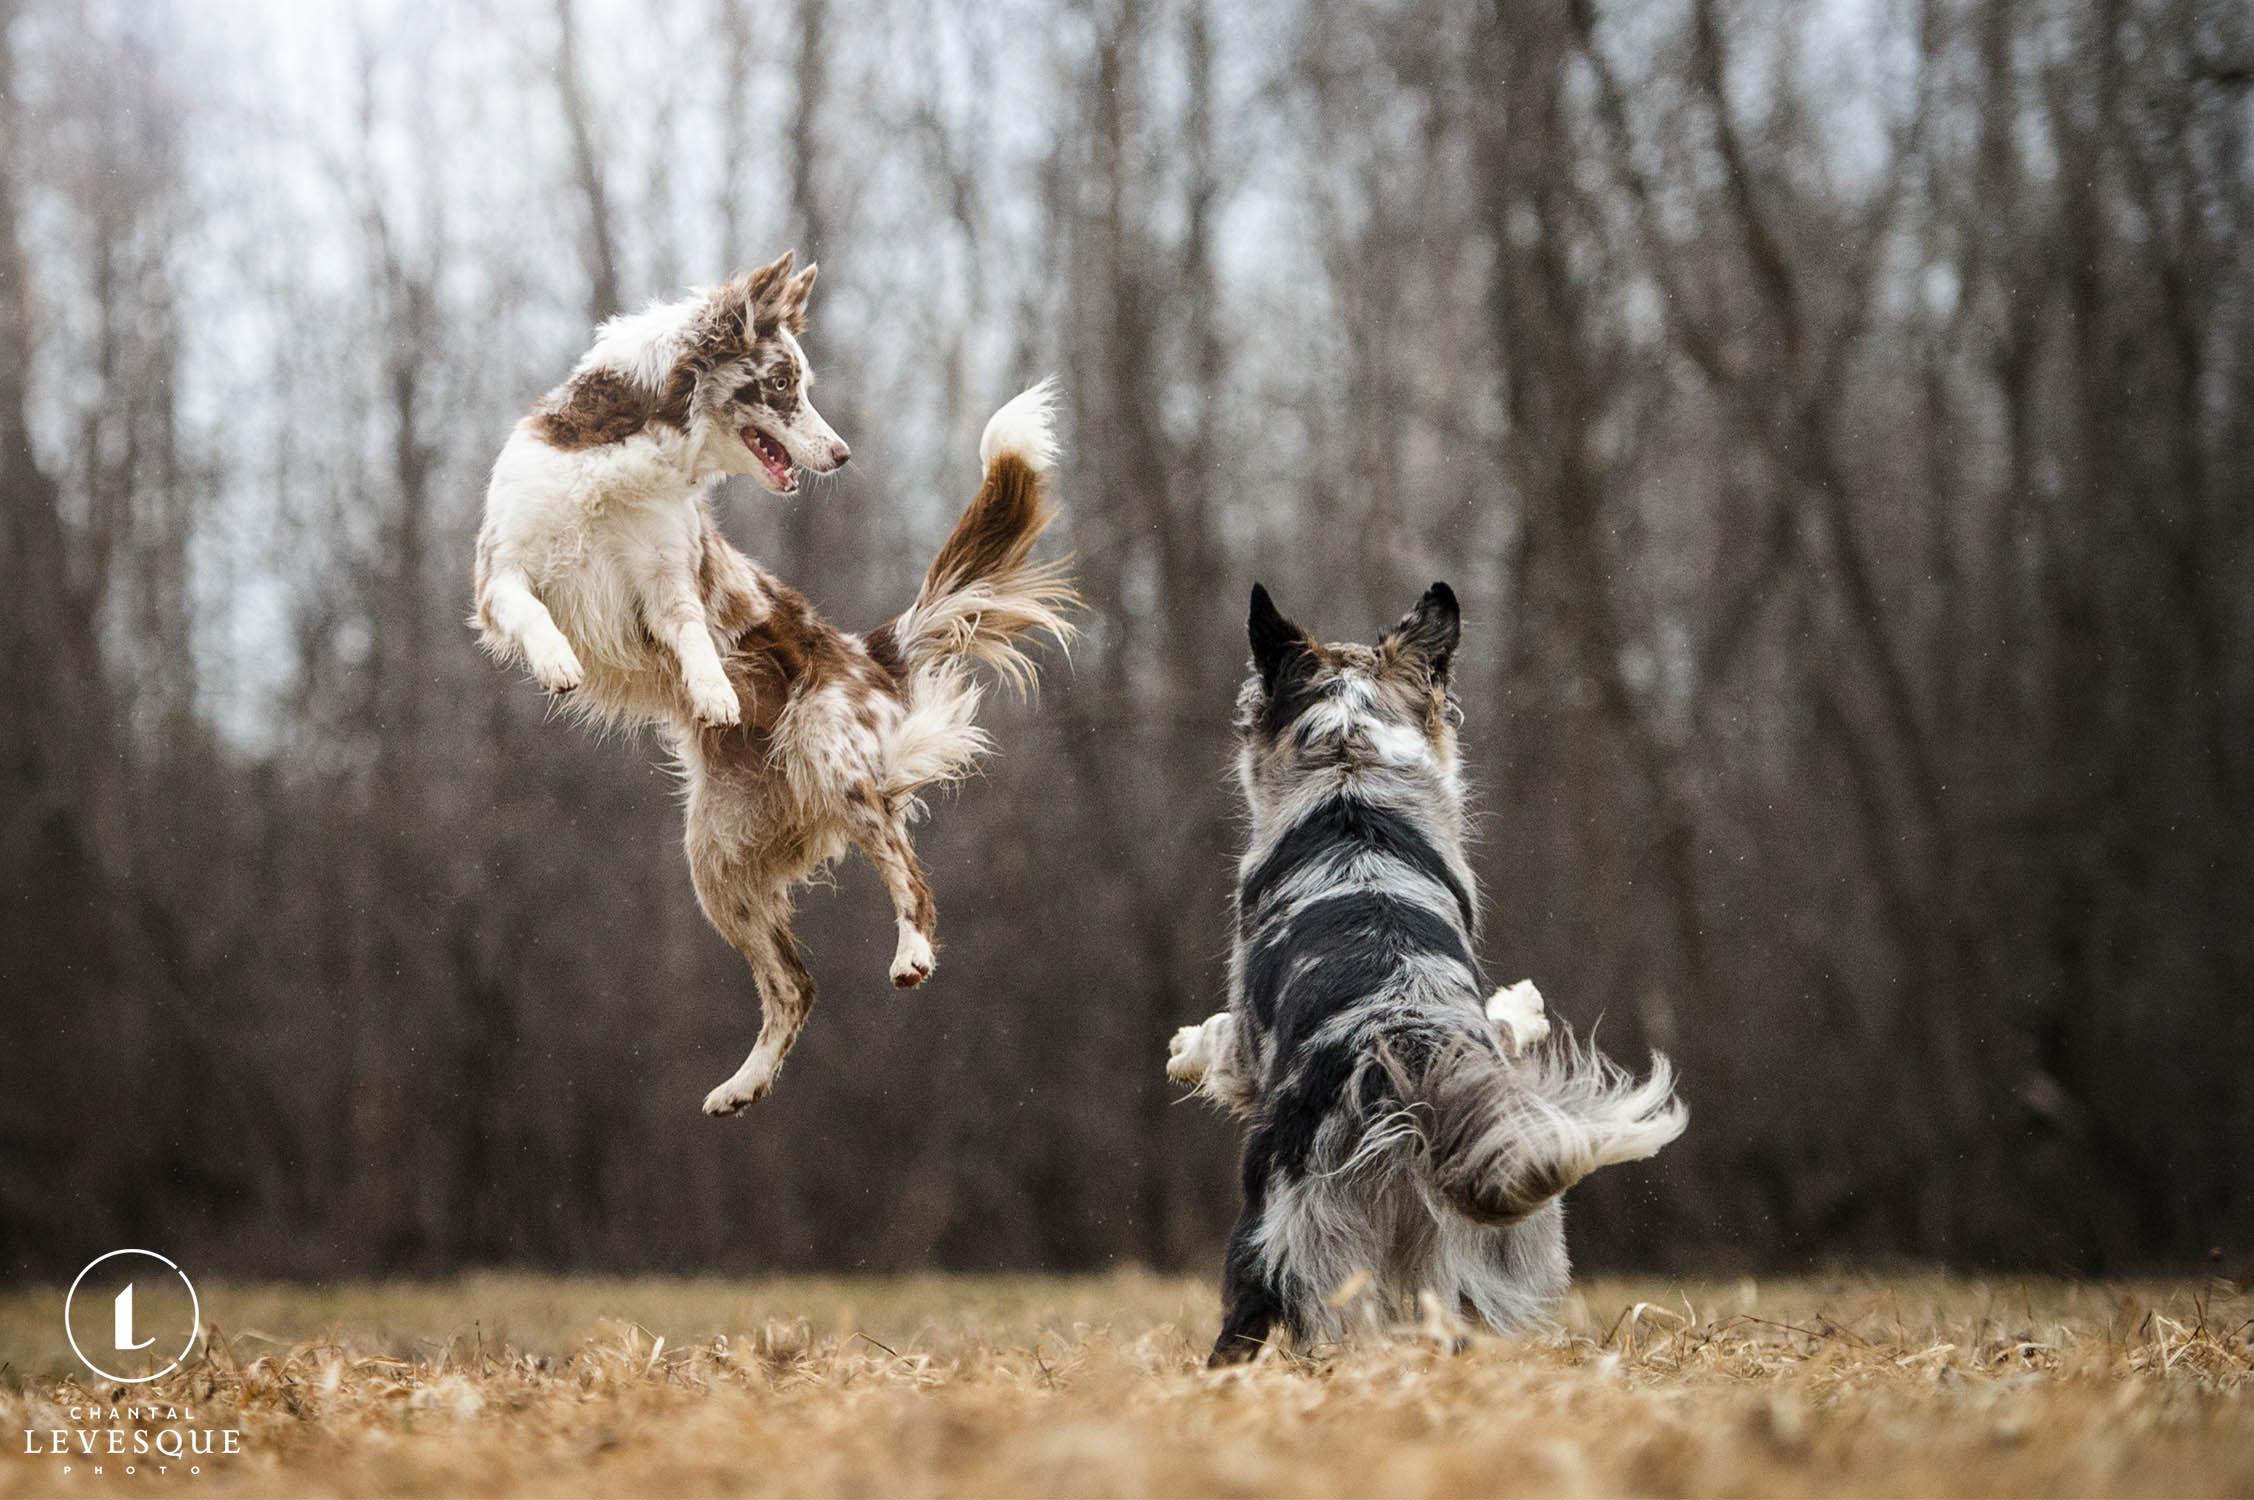 rockstar-dogs.jpg